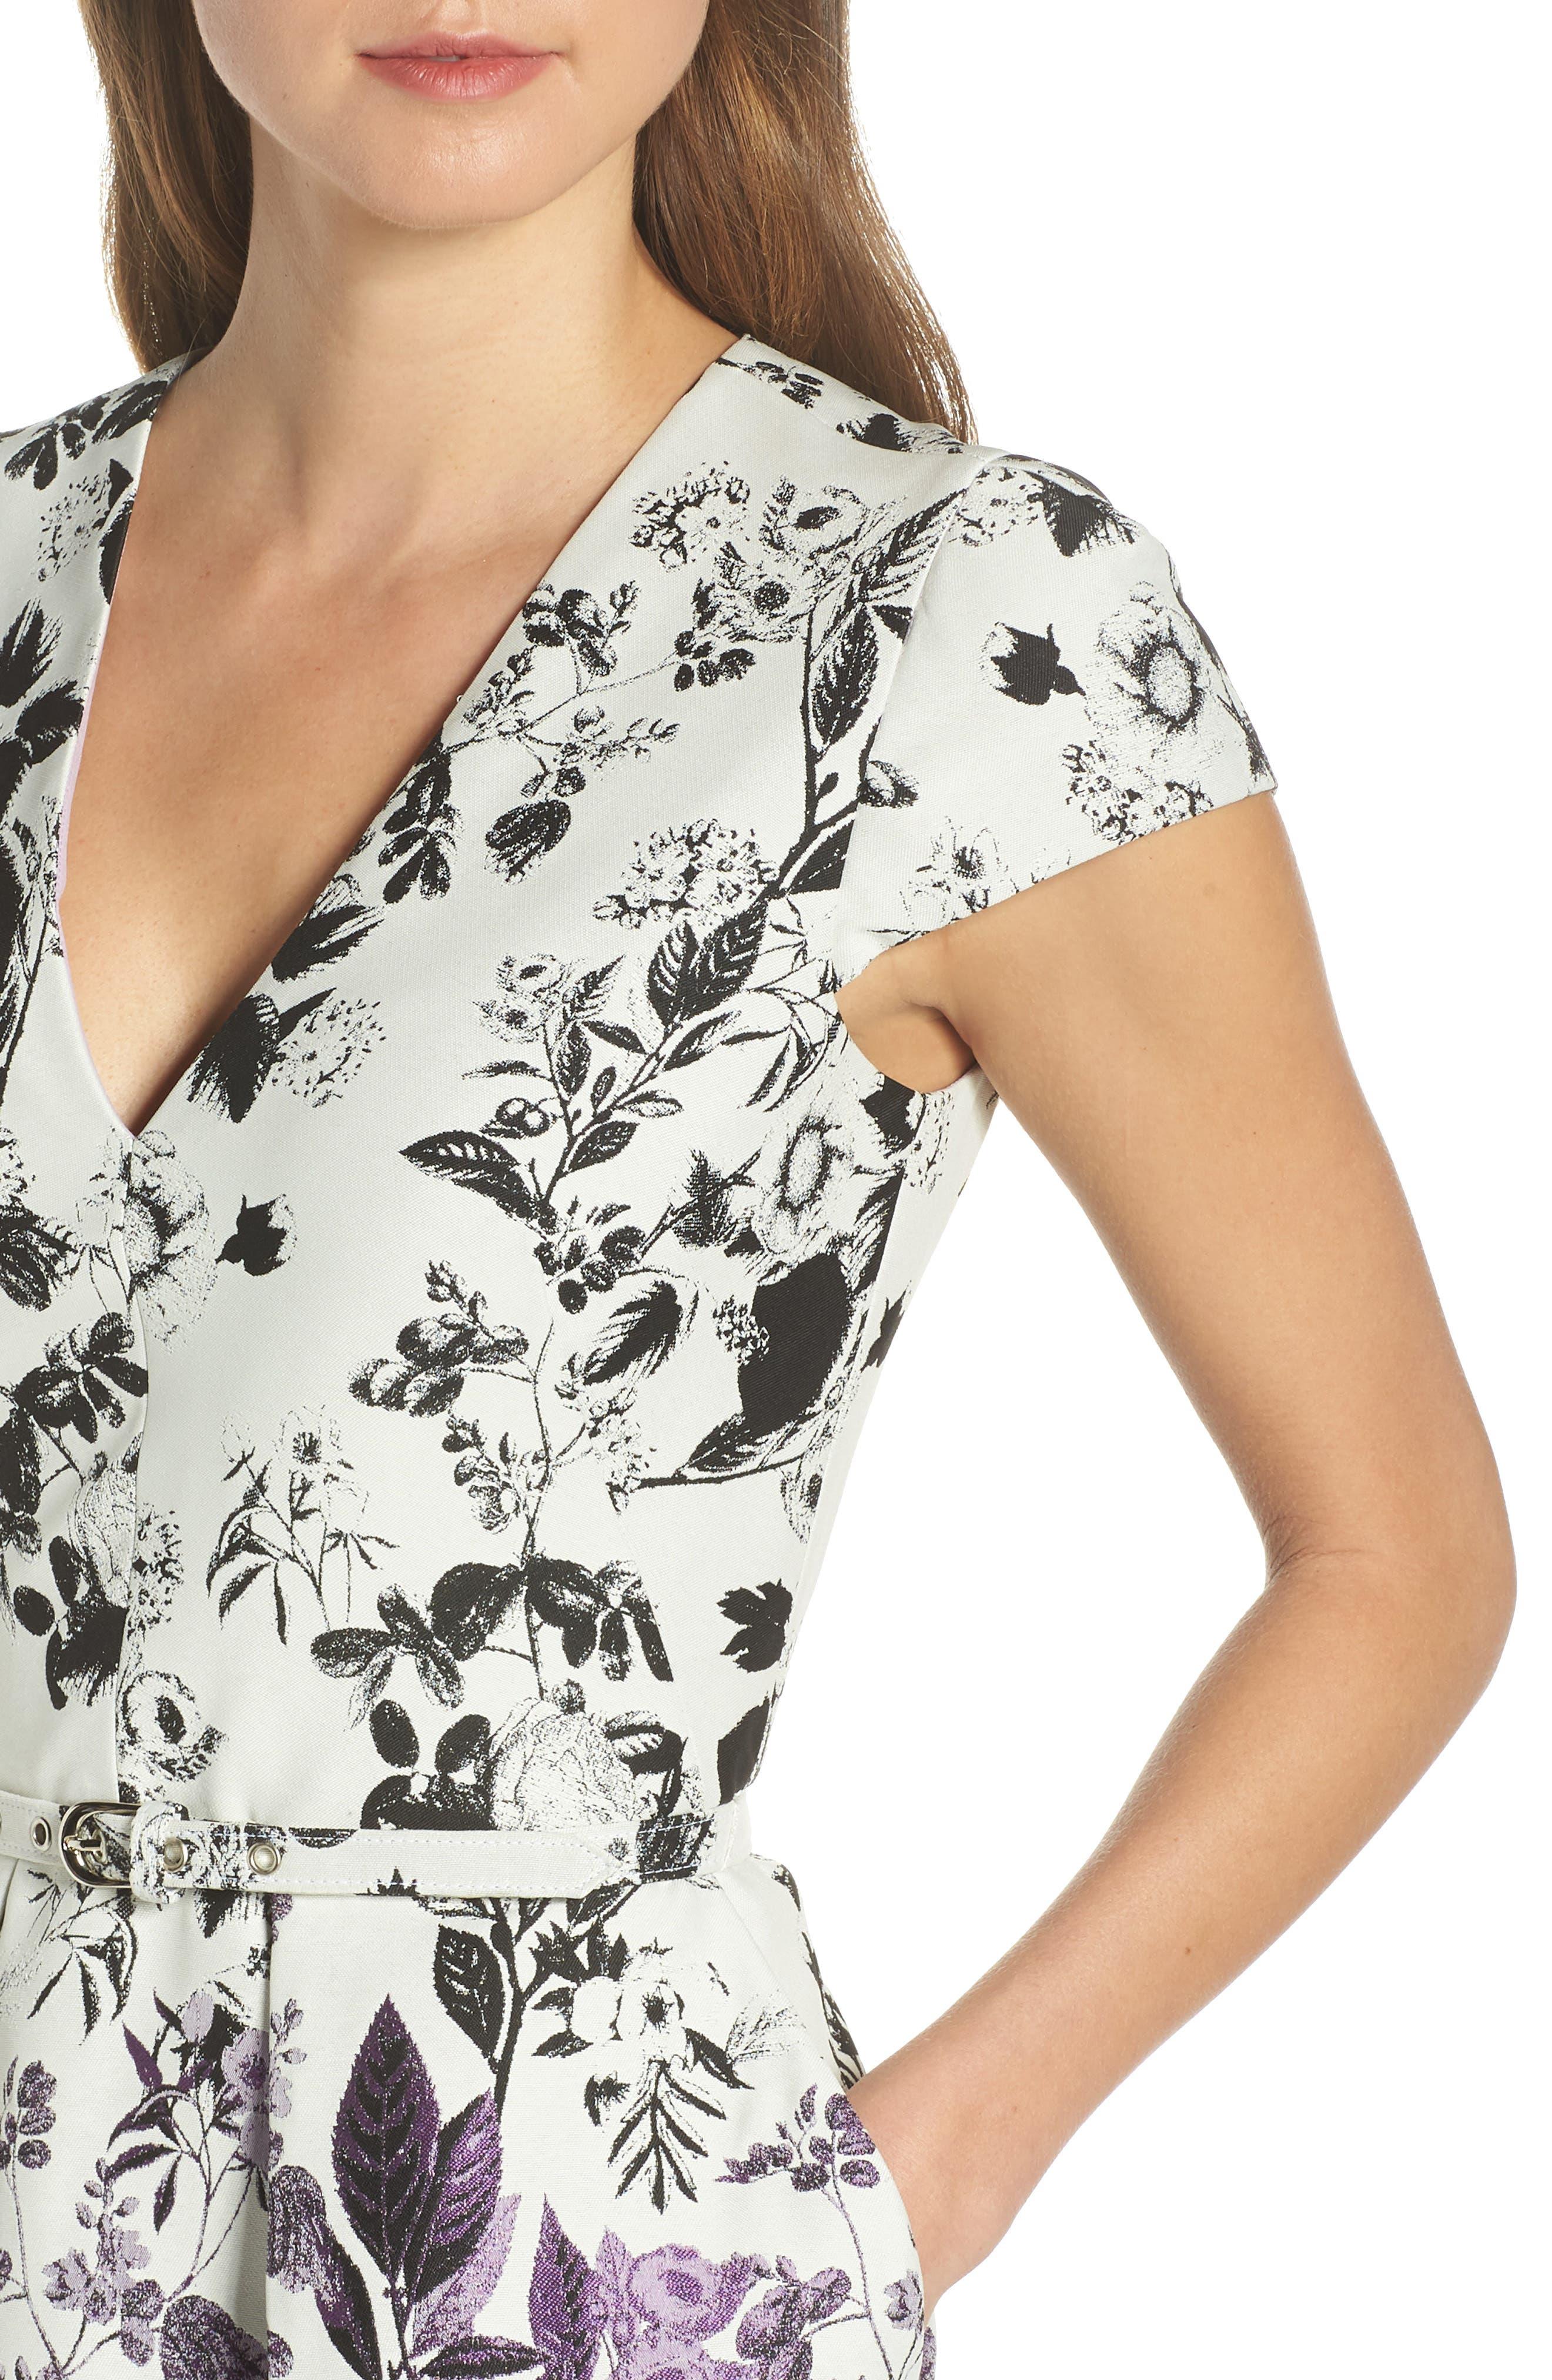 VINCE CAMUTO, Floral Jacquard Fit and Flare Dress, Alternate thumbnail 5, color, PURPLE MULTI